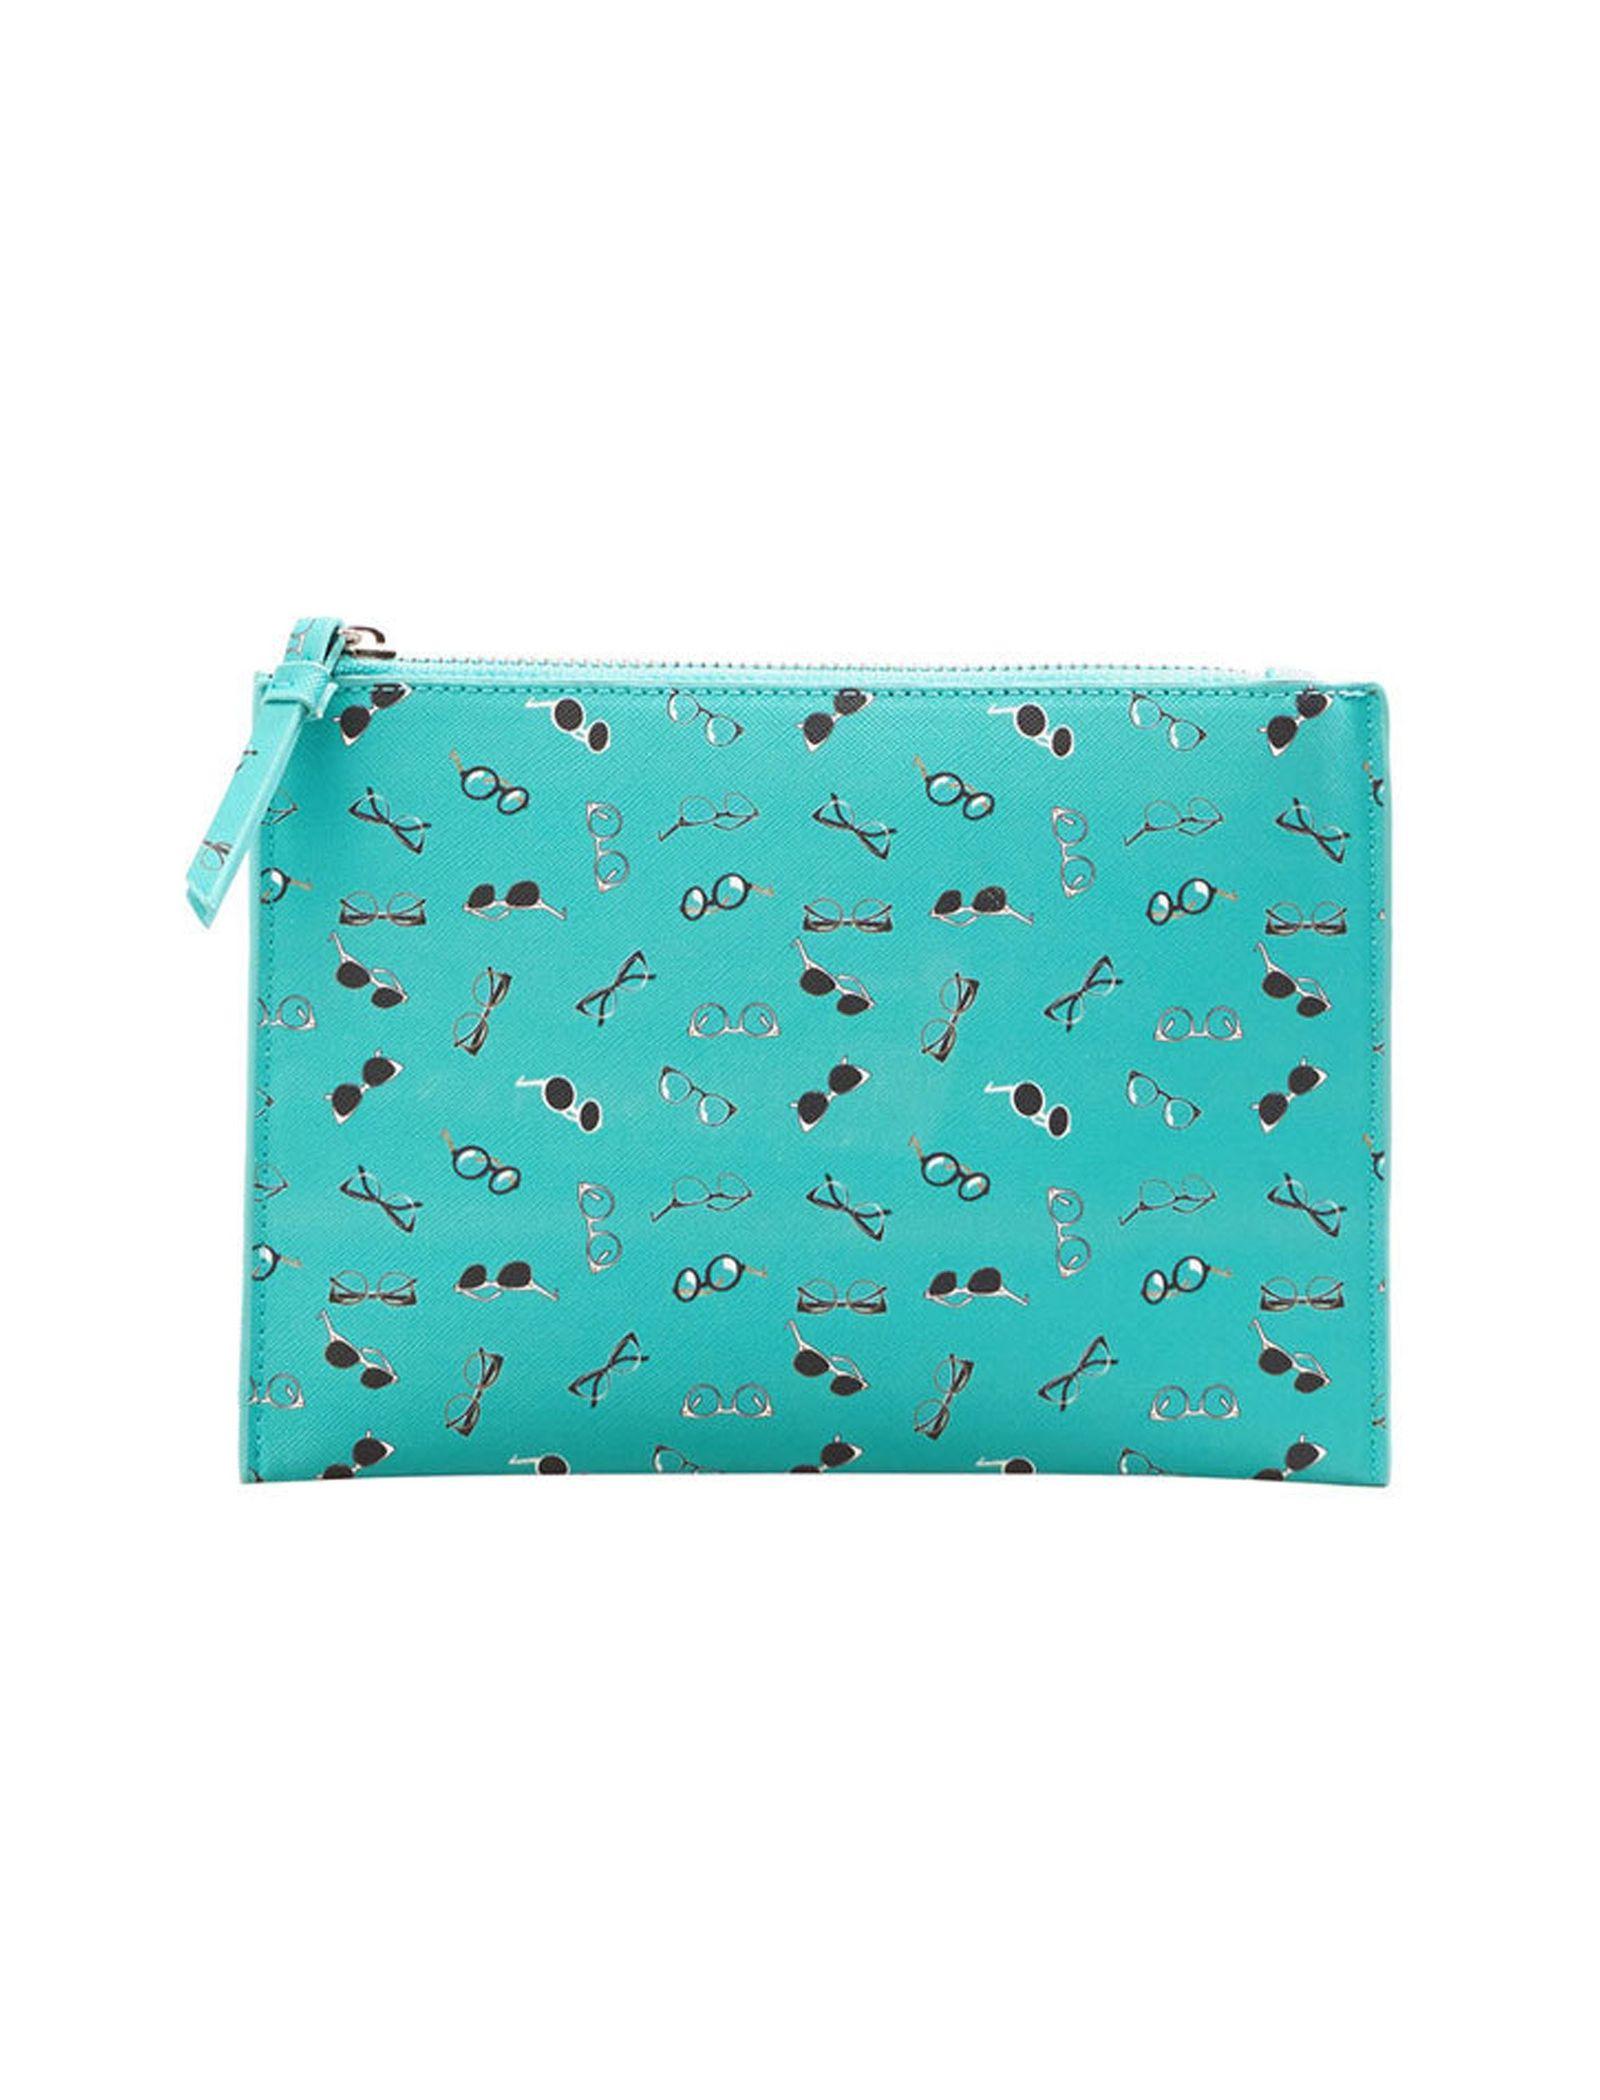 کیف لوازم آرایش زنانه - مانگو - سبز آبي - 1